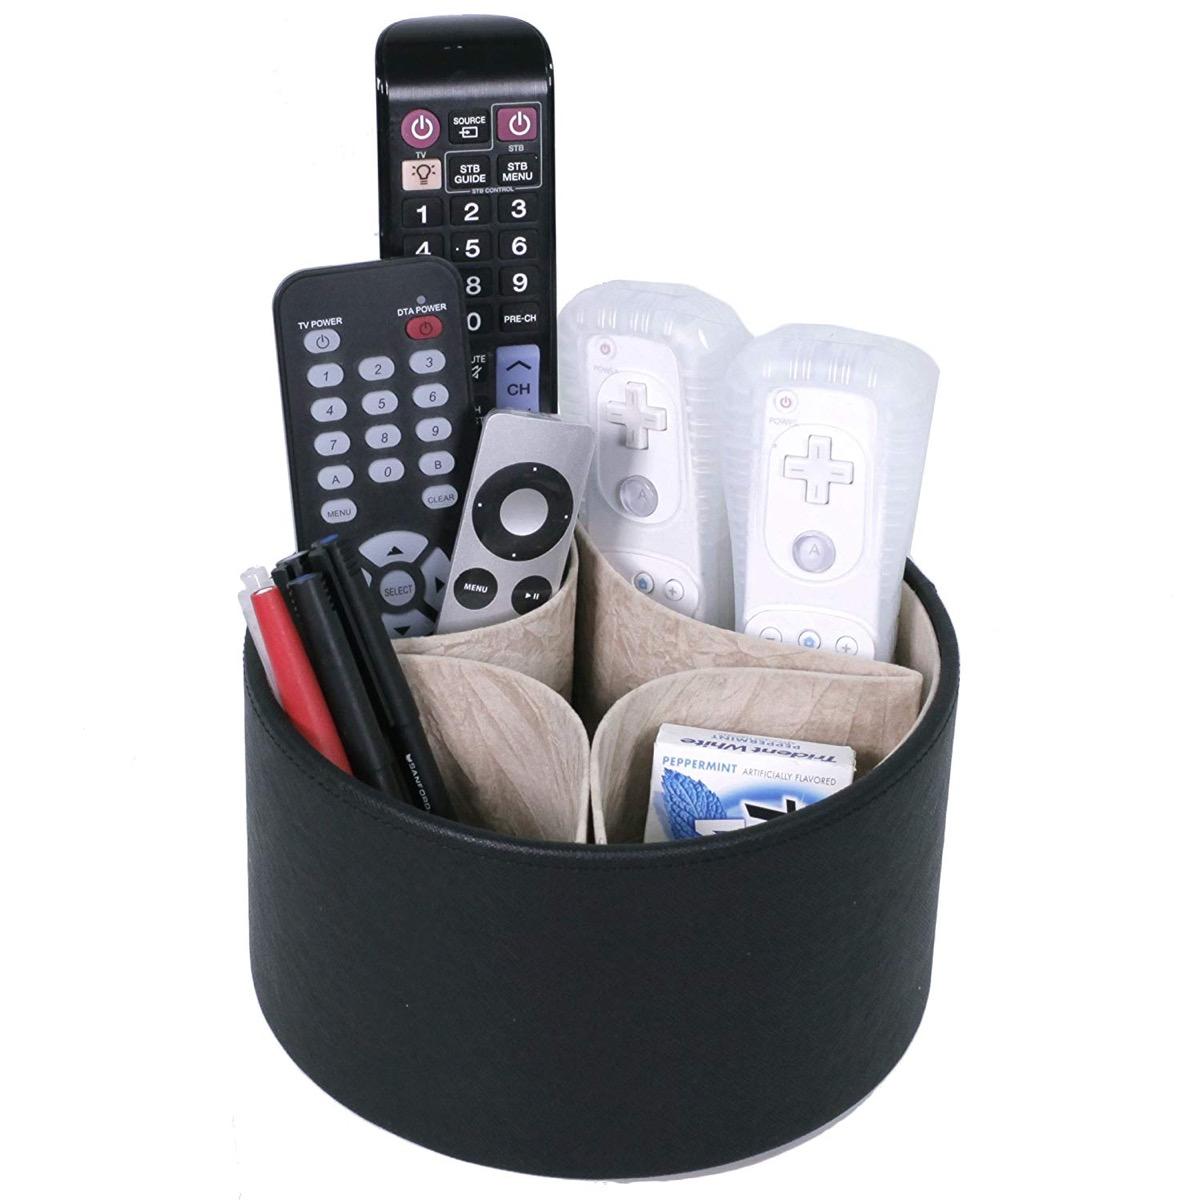 Remote Holder {Organizational Products on Amazon}